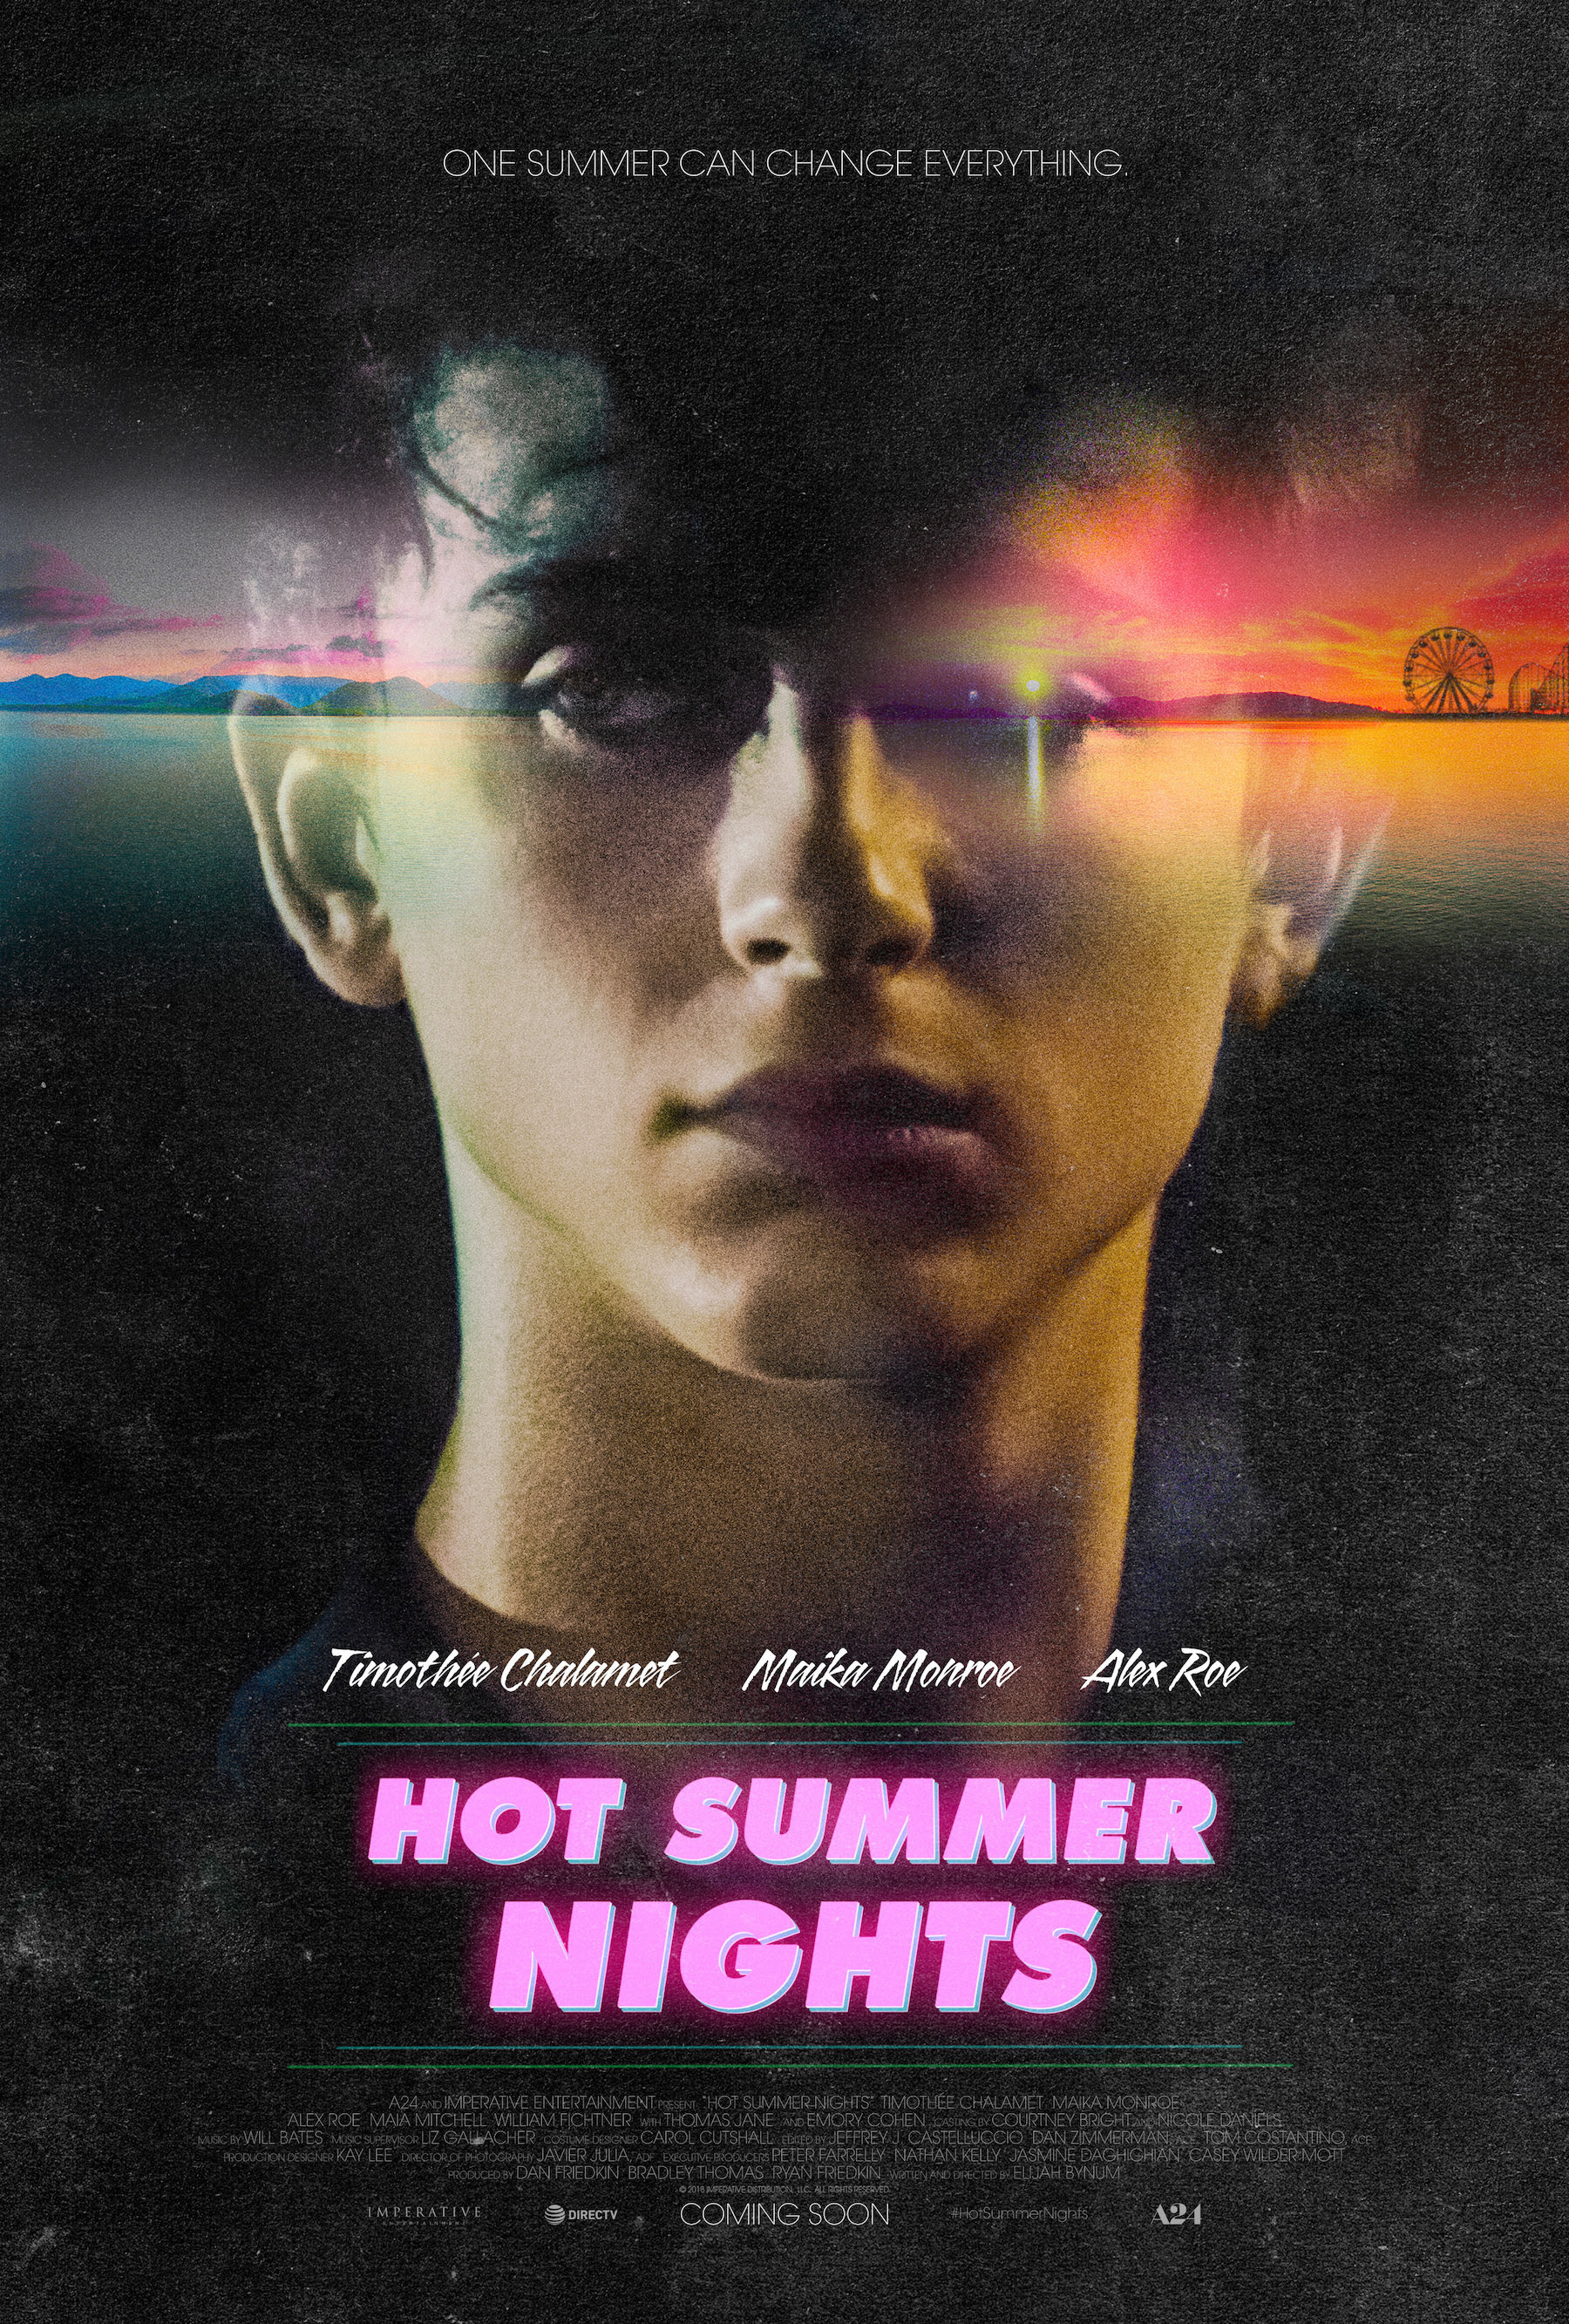 Hot Summer Nights  Filmes similares - AdoroCinema 5c0c8594fa0ee